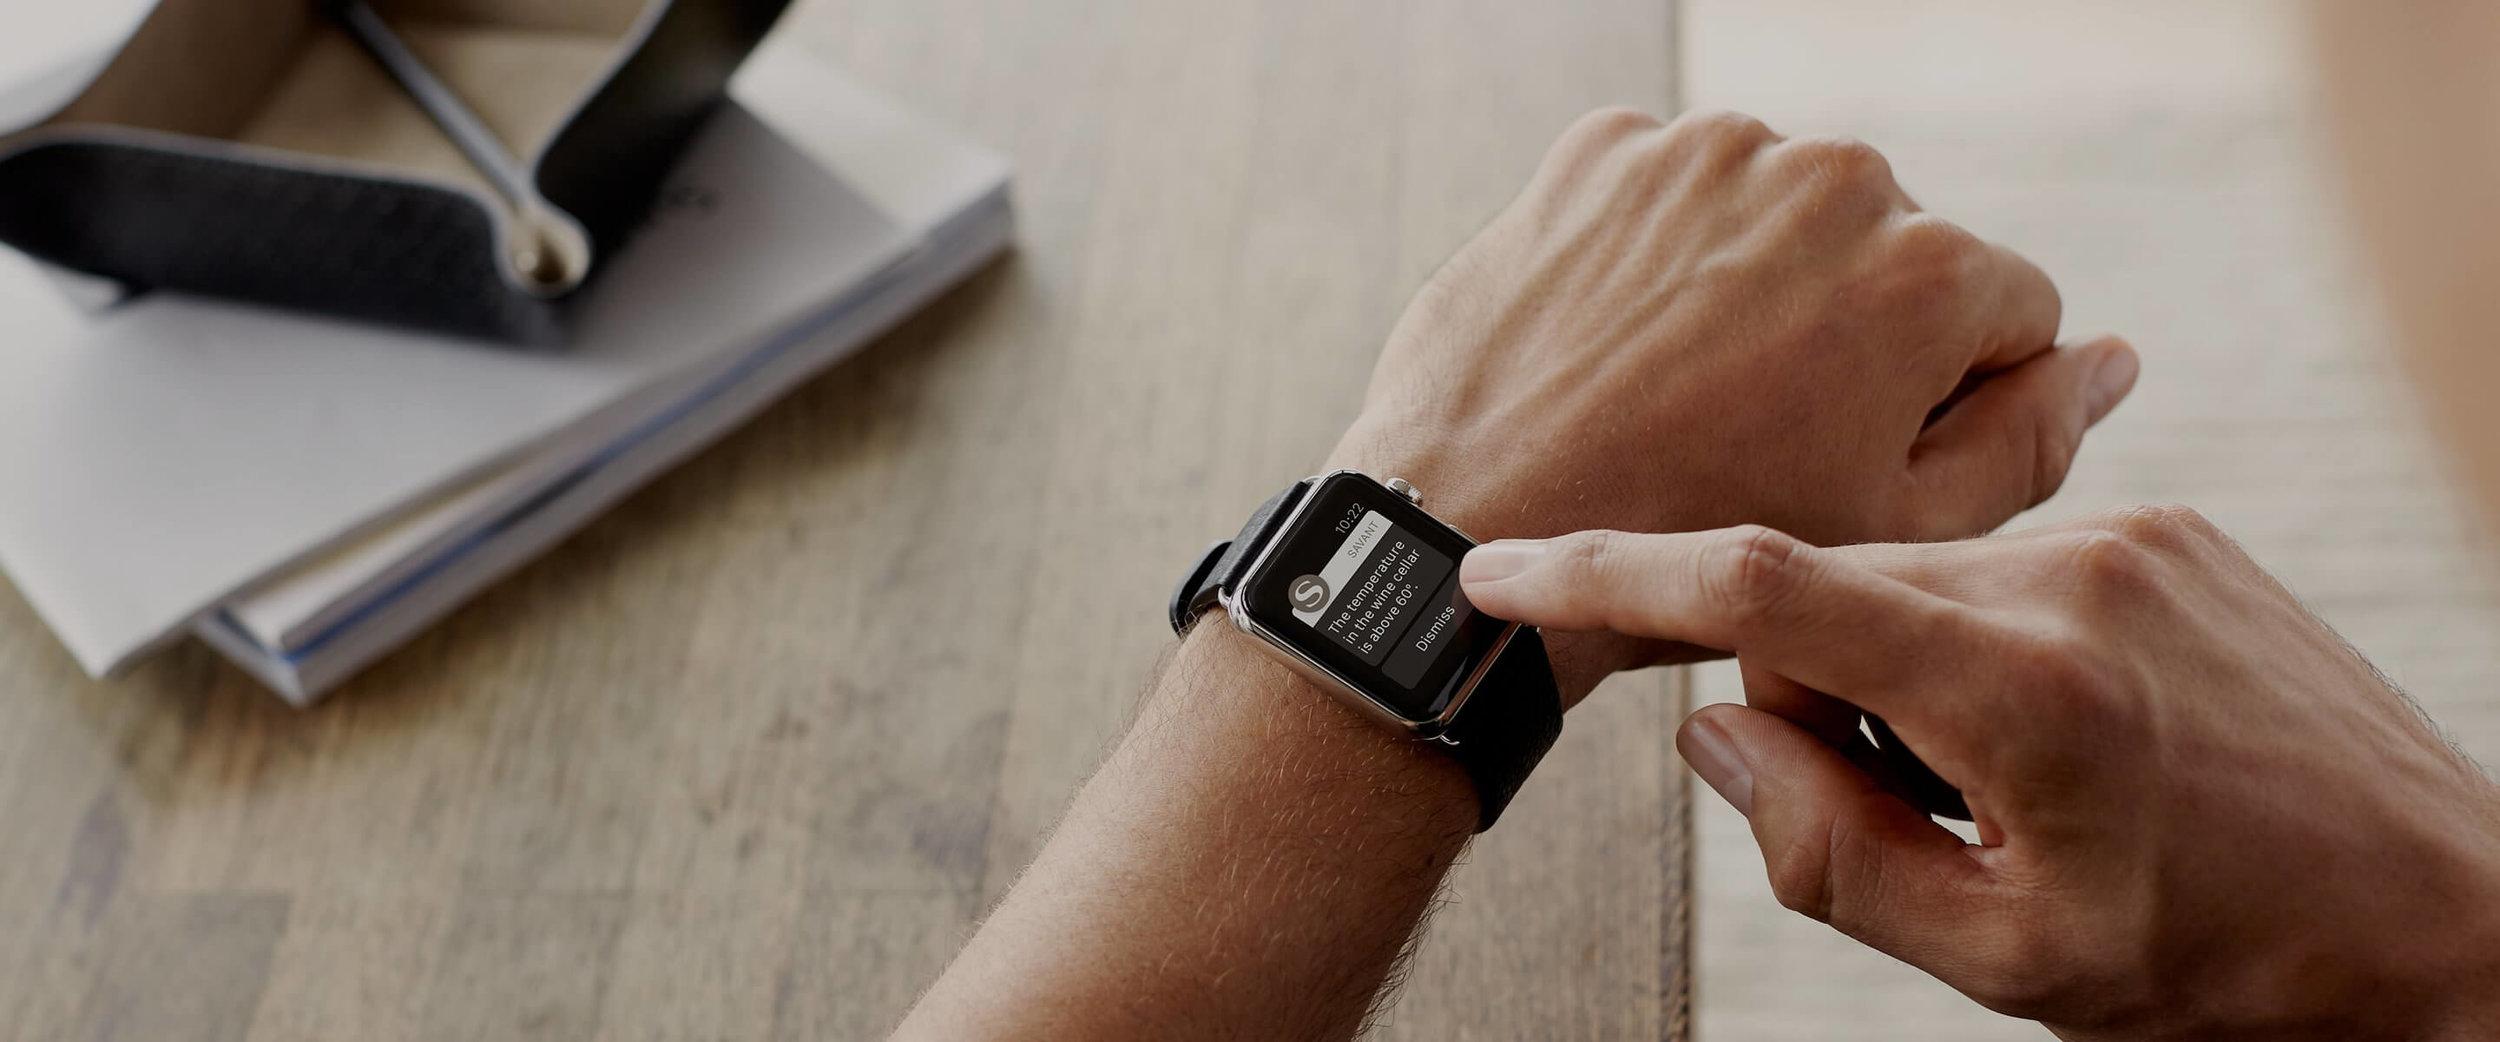 Savant Apple Watch.jpg